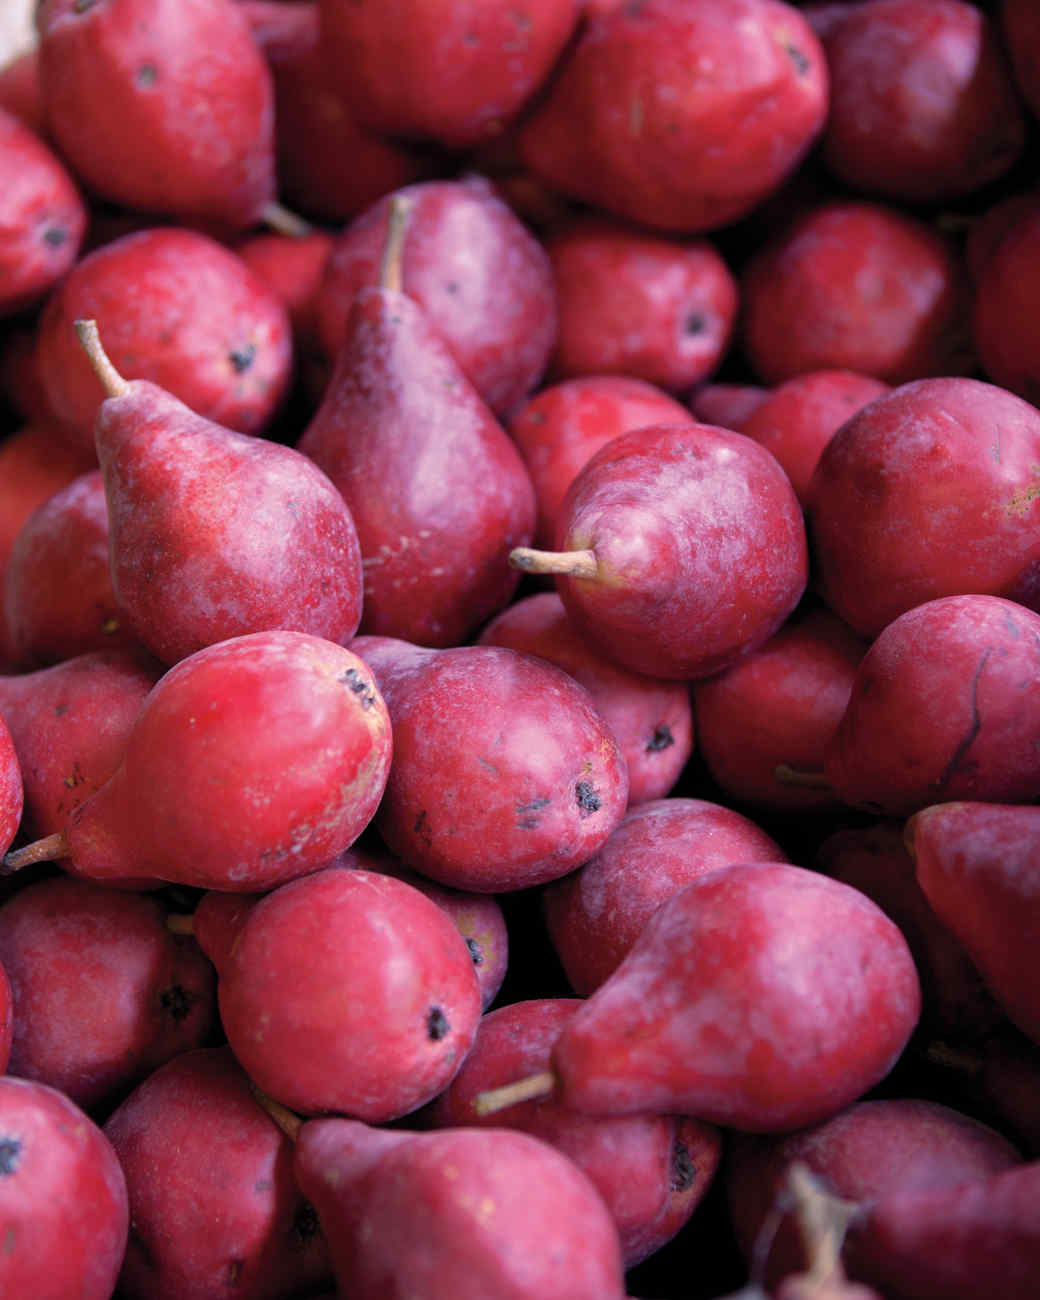 red-anjou-pears-md108103.jpg